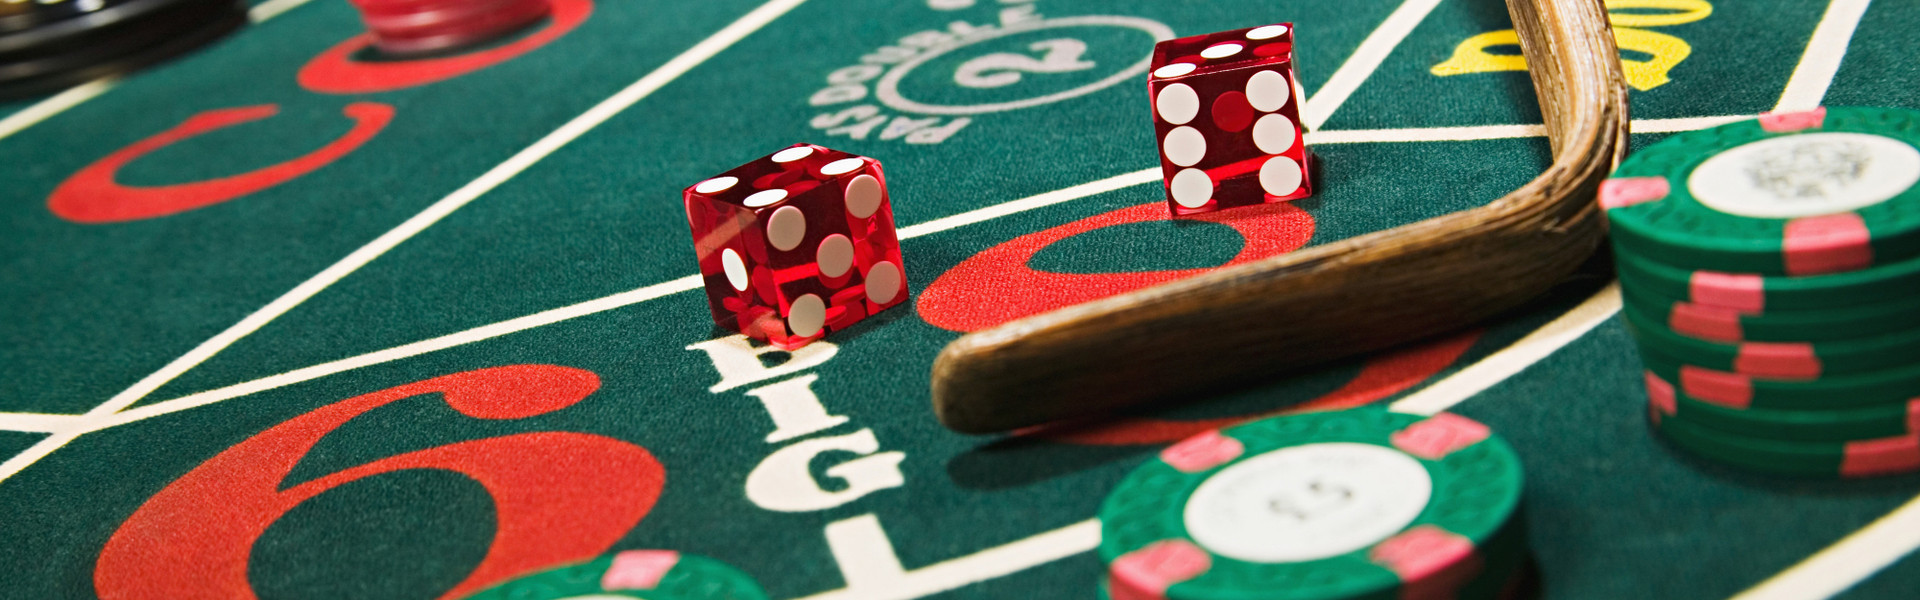 WOW! Rewards Program Rules | Westgate Las Vegas Resort & Casino